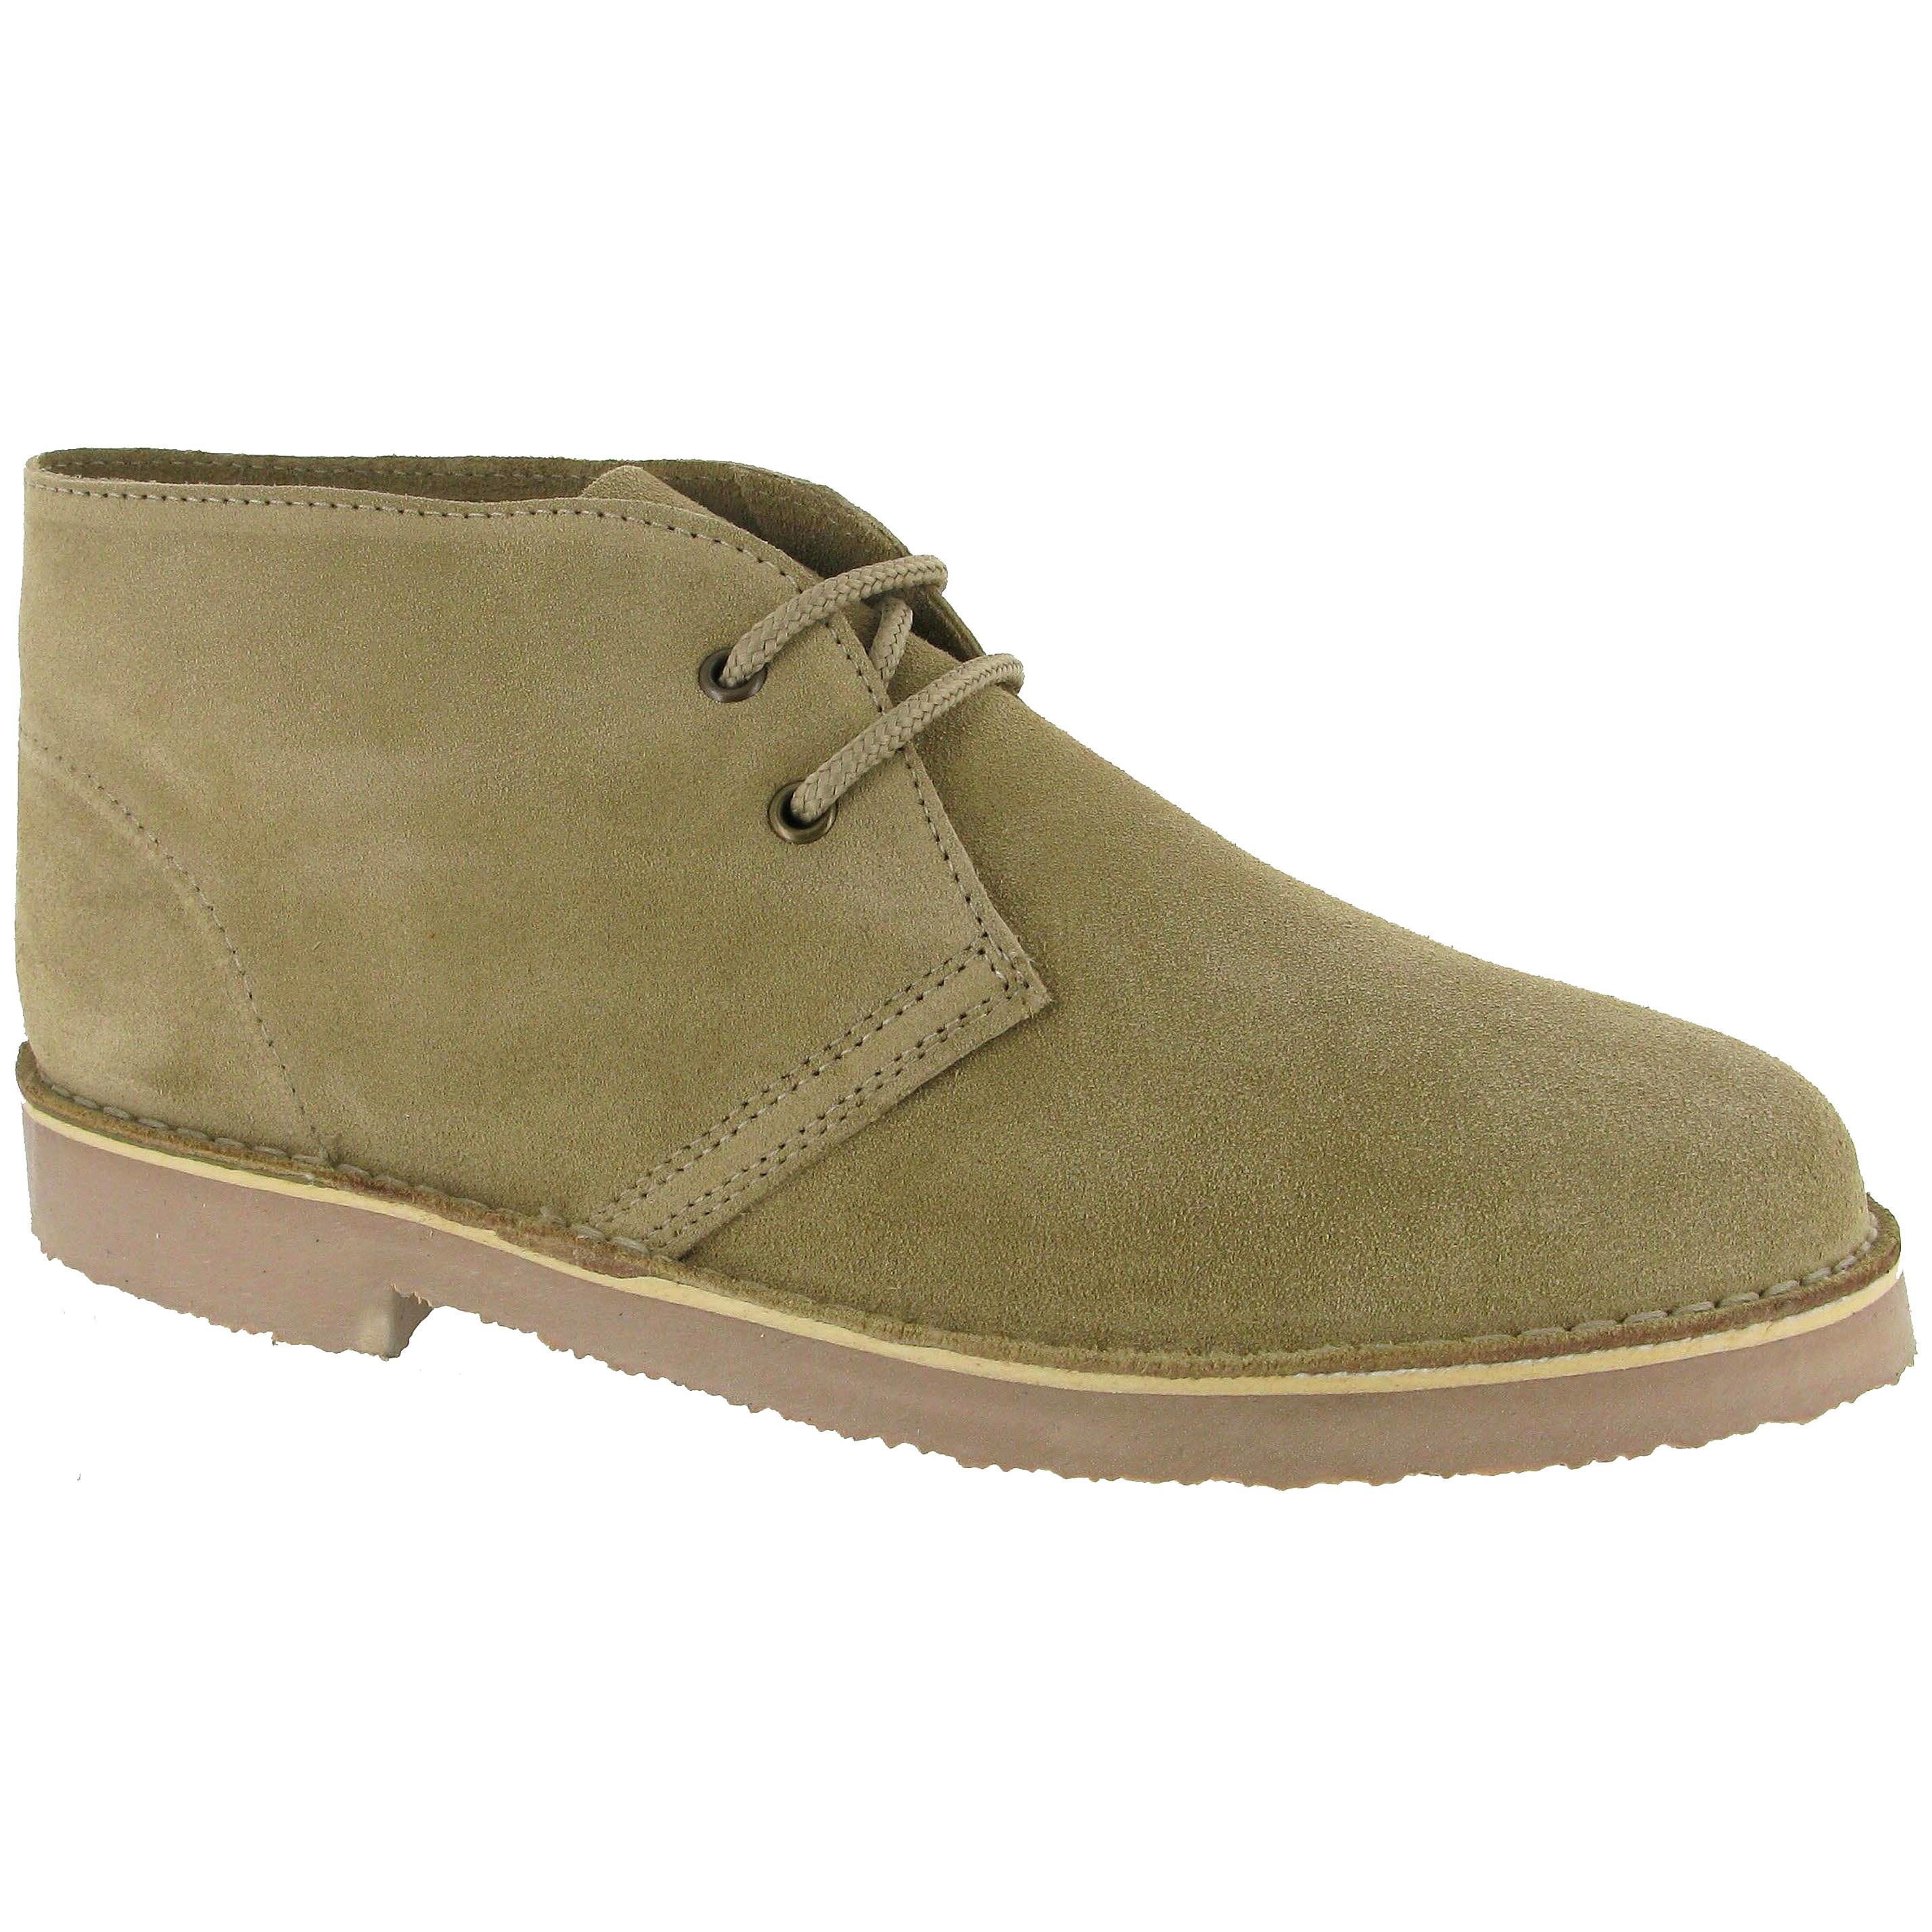 Cotswold Sahara Desert Boot / Mens Boots (15 UK) (Sand)